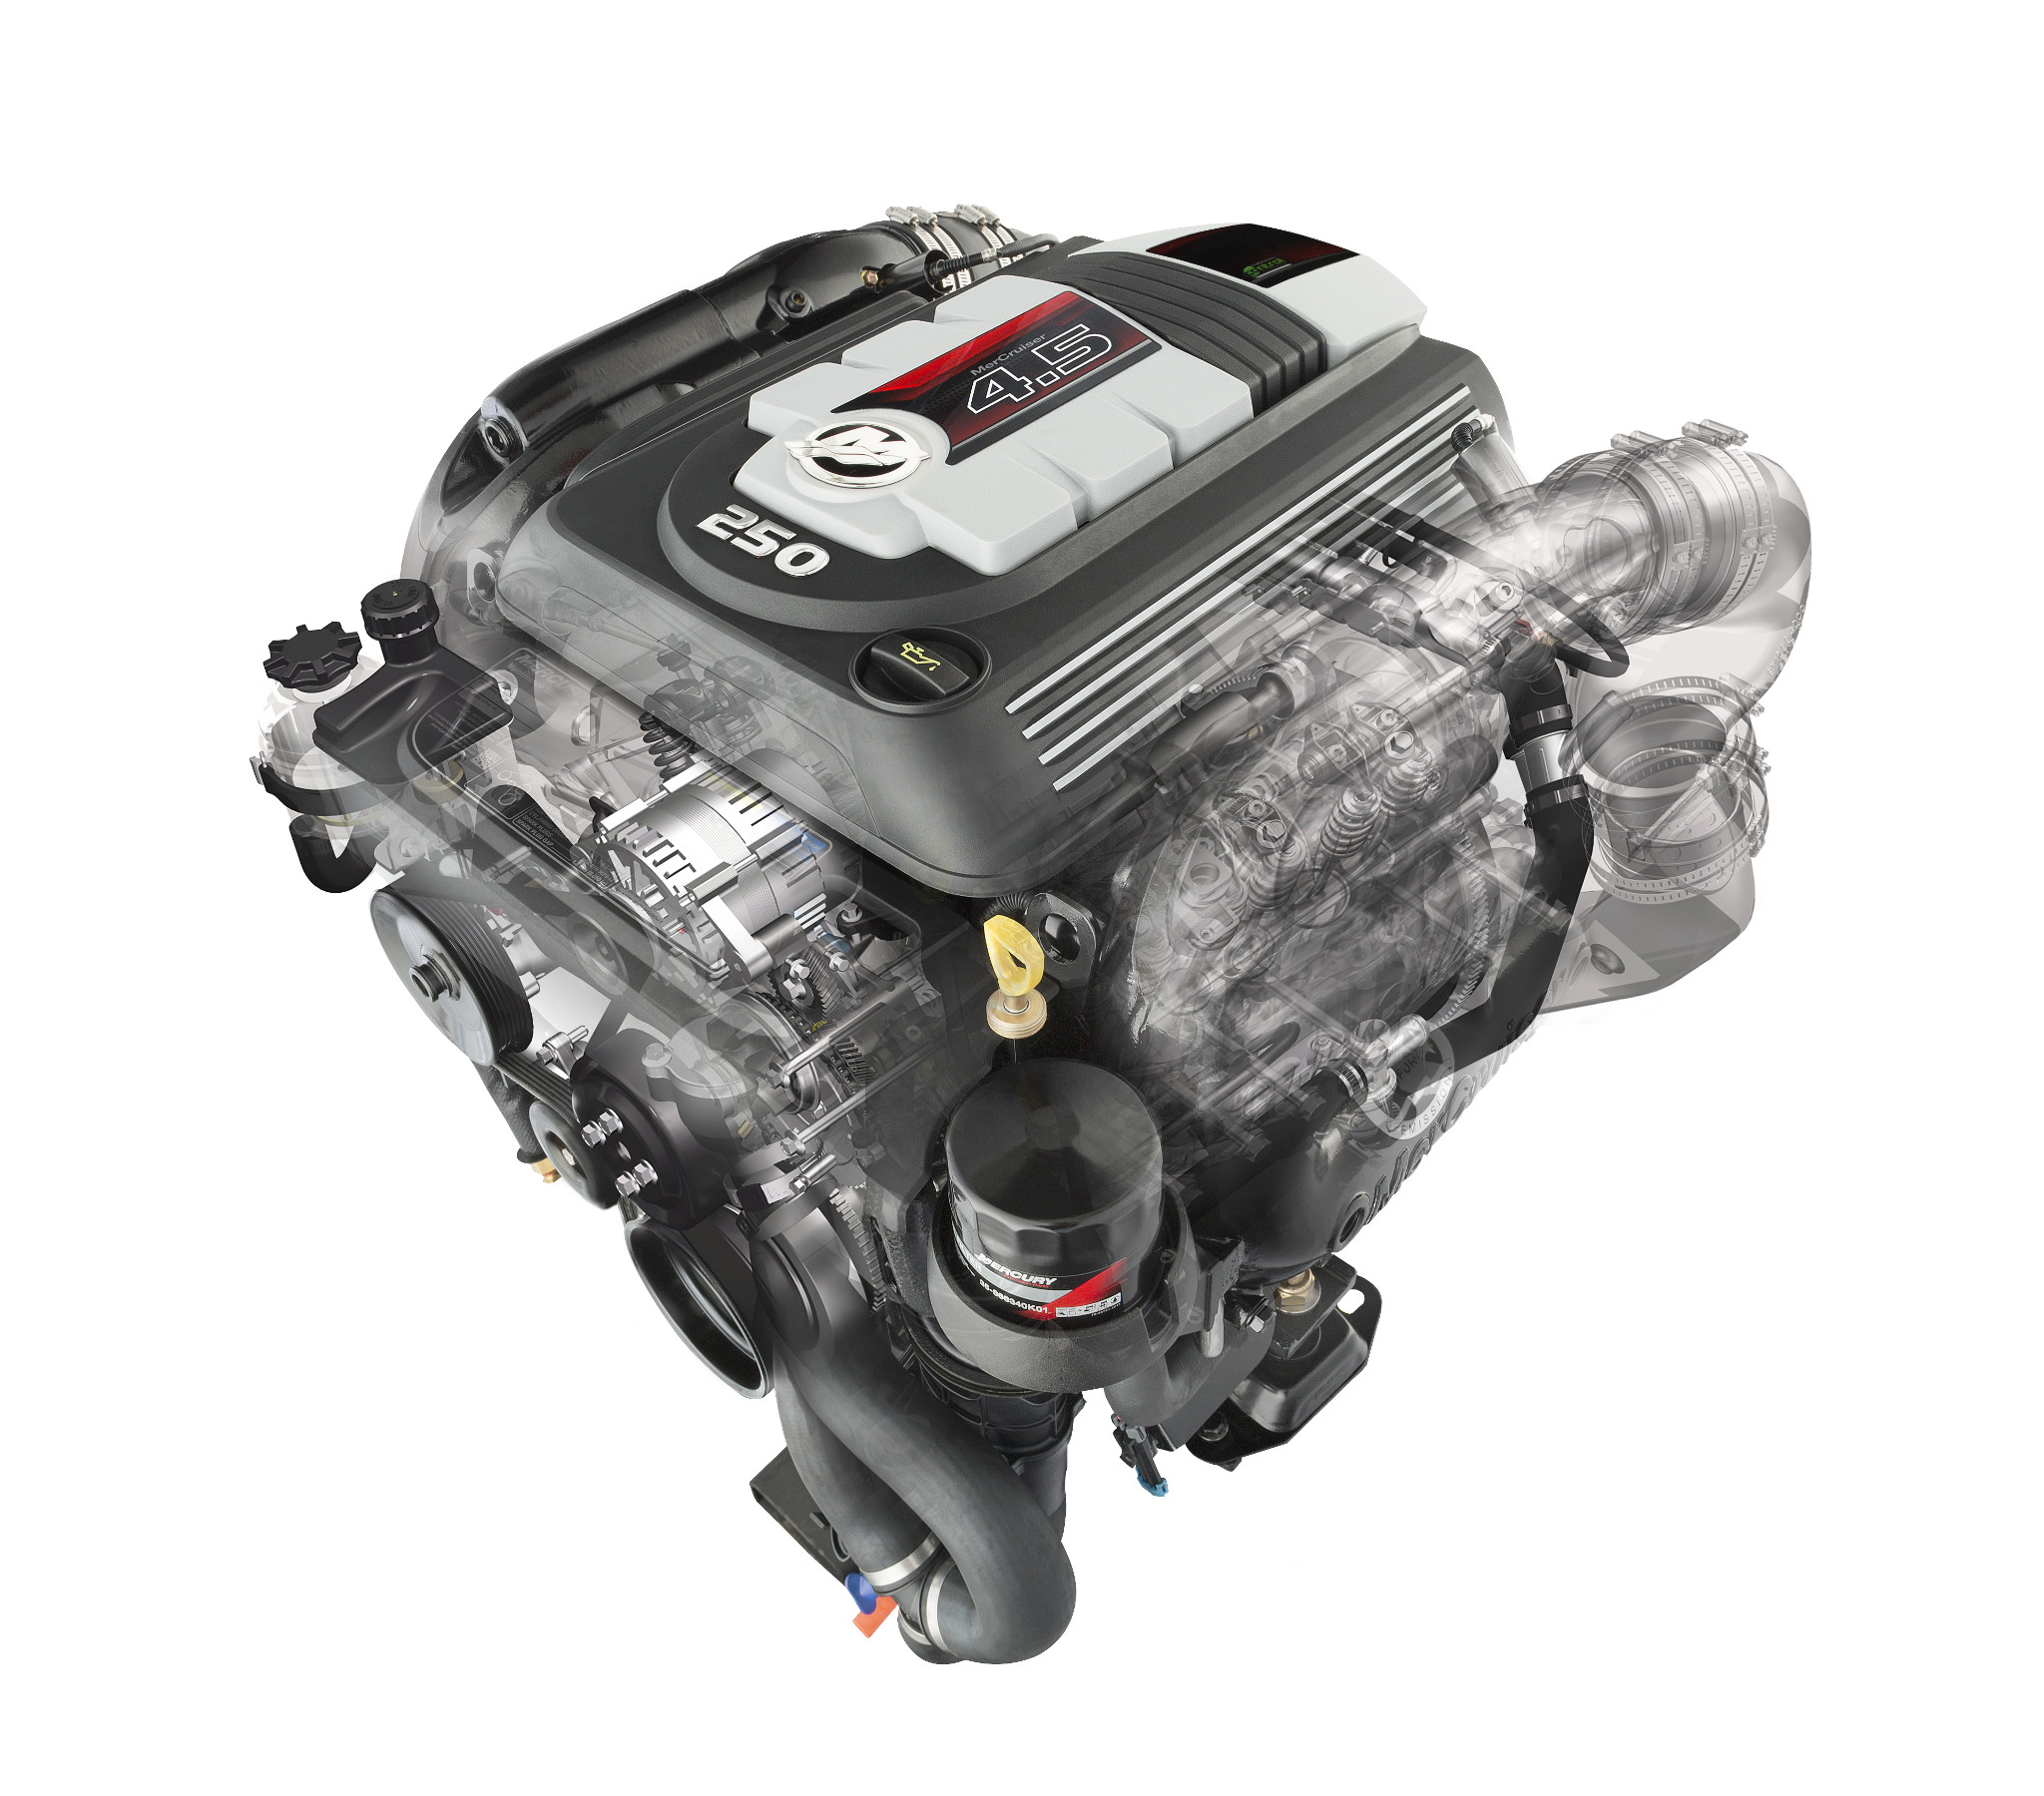 MerCruiser Small block hekaandrijving motoren